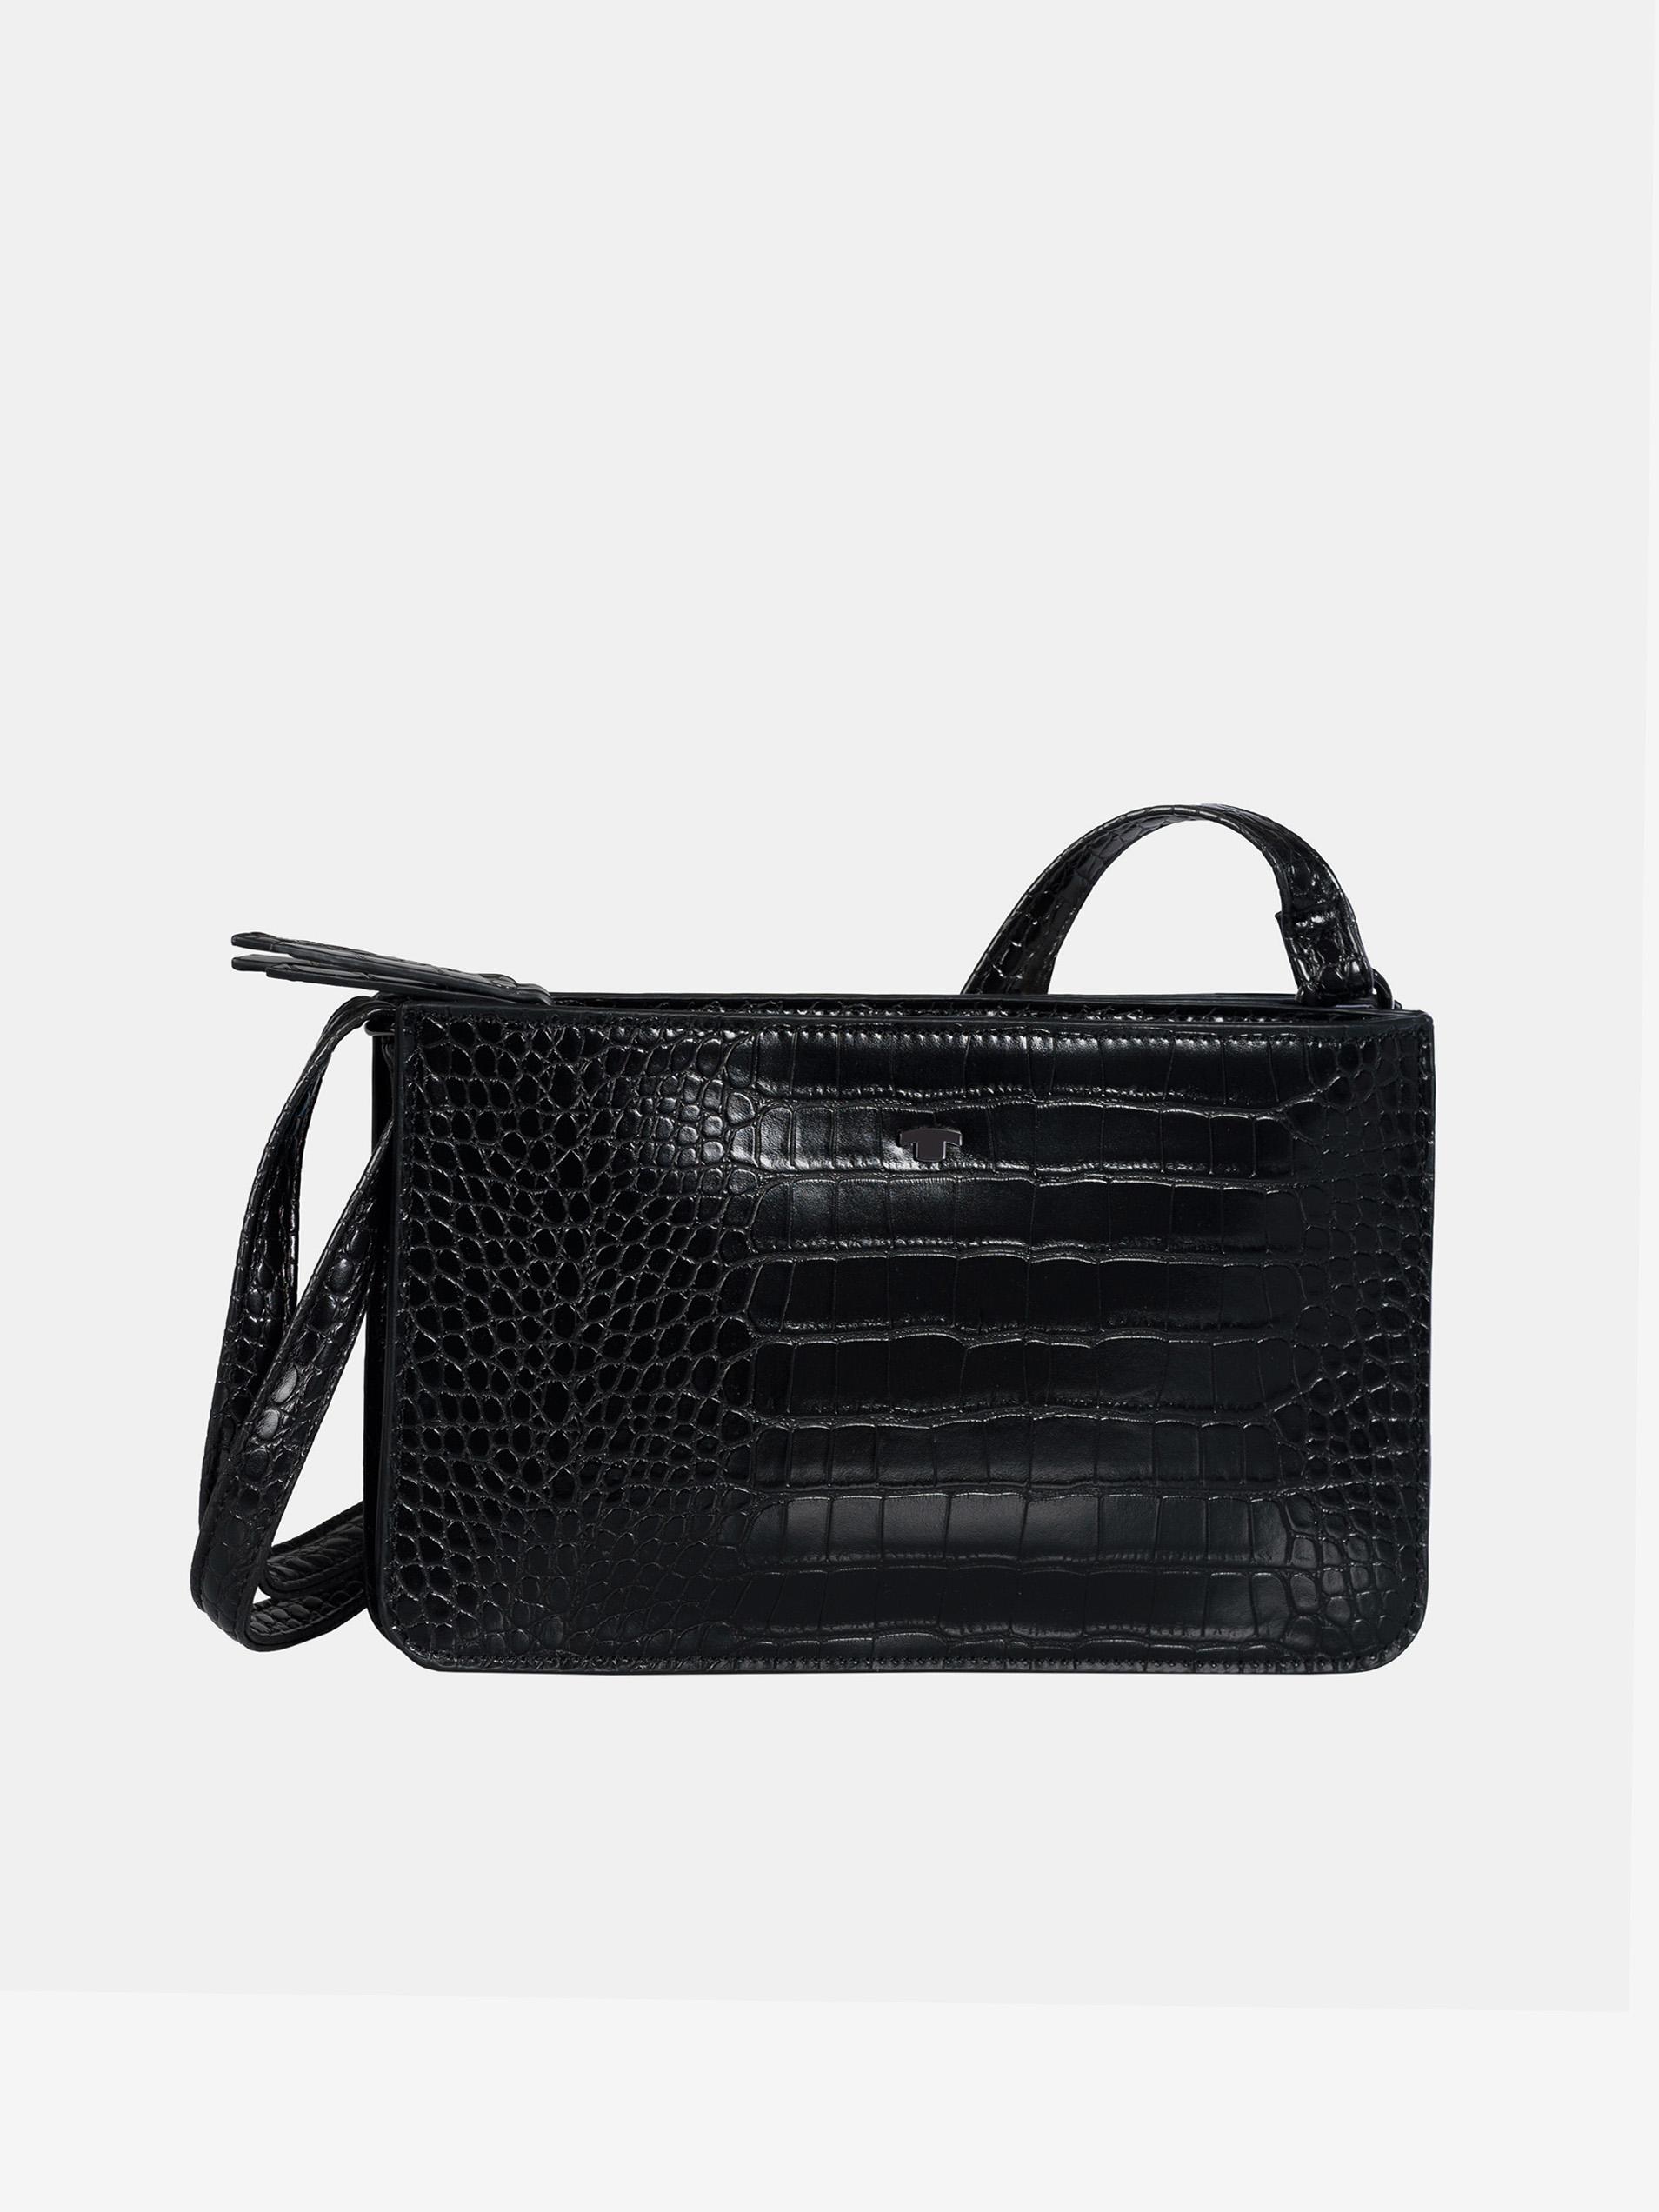 Crna torbica crossbody s krokodil uzorkom Tom Tailor